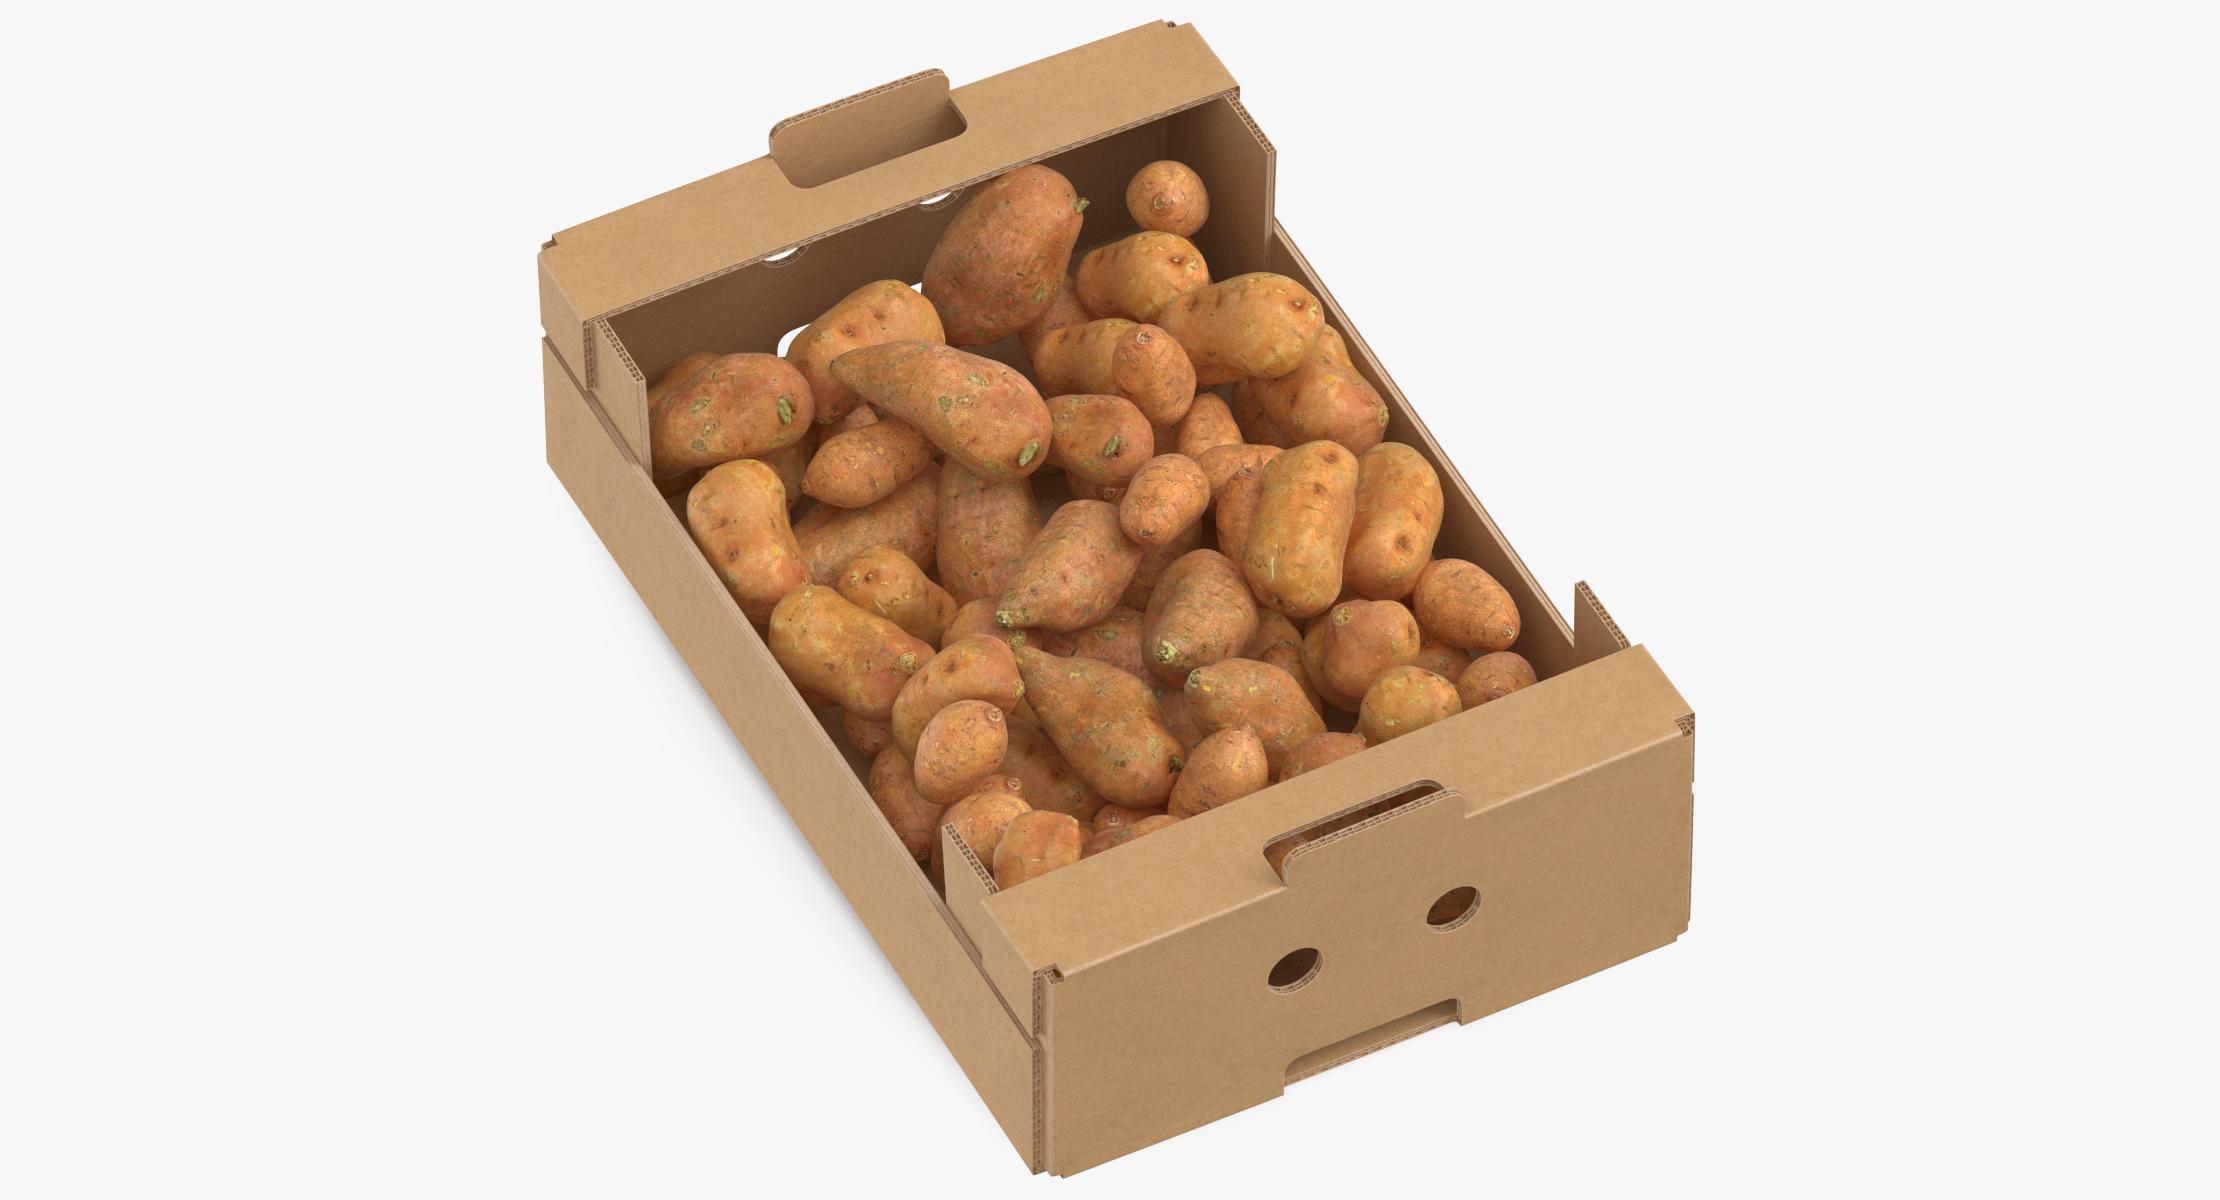 Cardboard Box 02 With Sweet Potatoes Full 3D model - reel 1